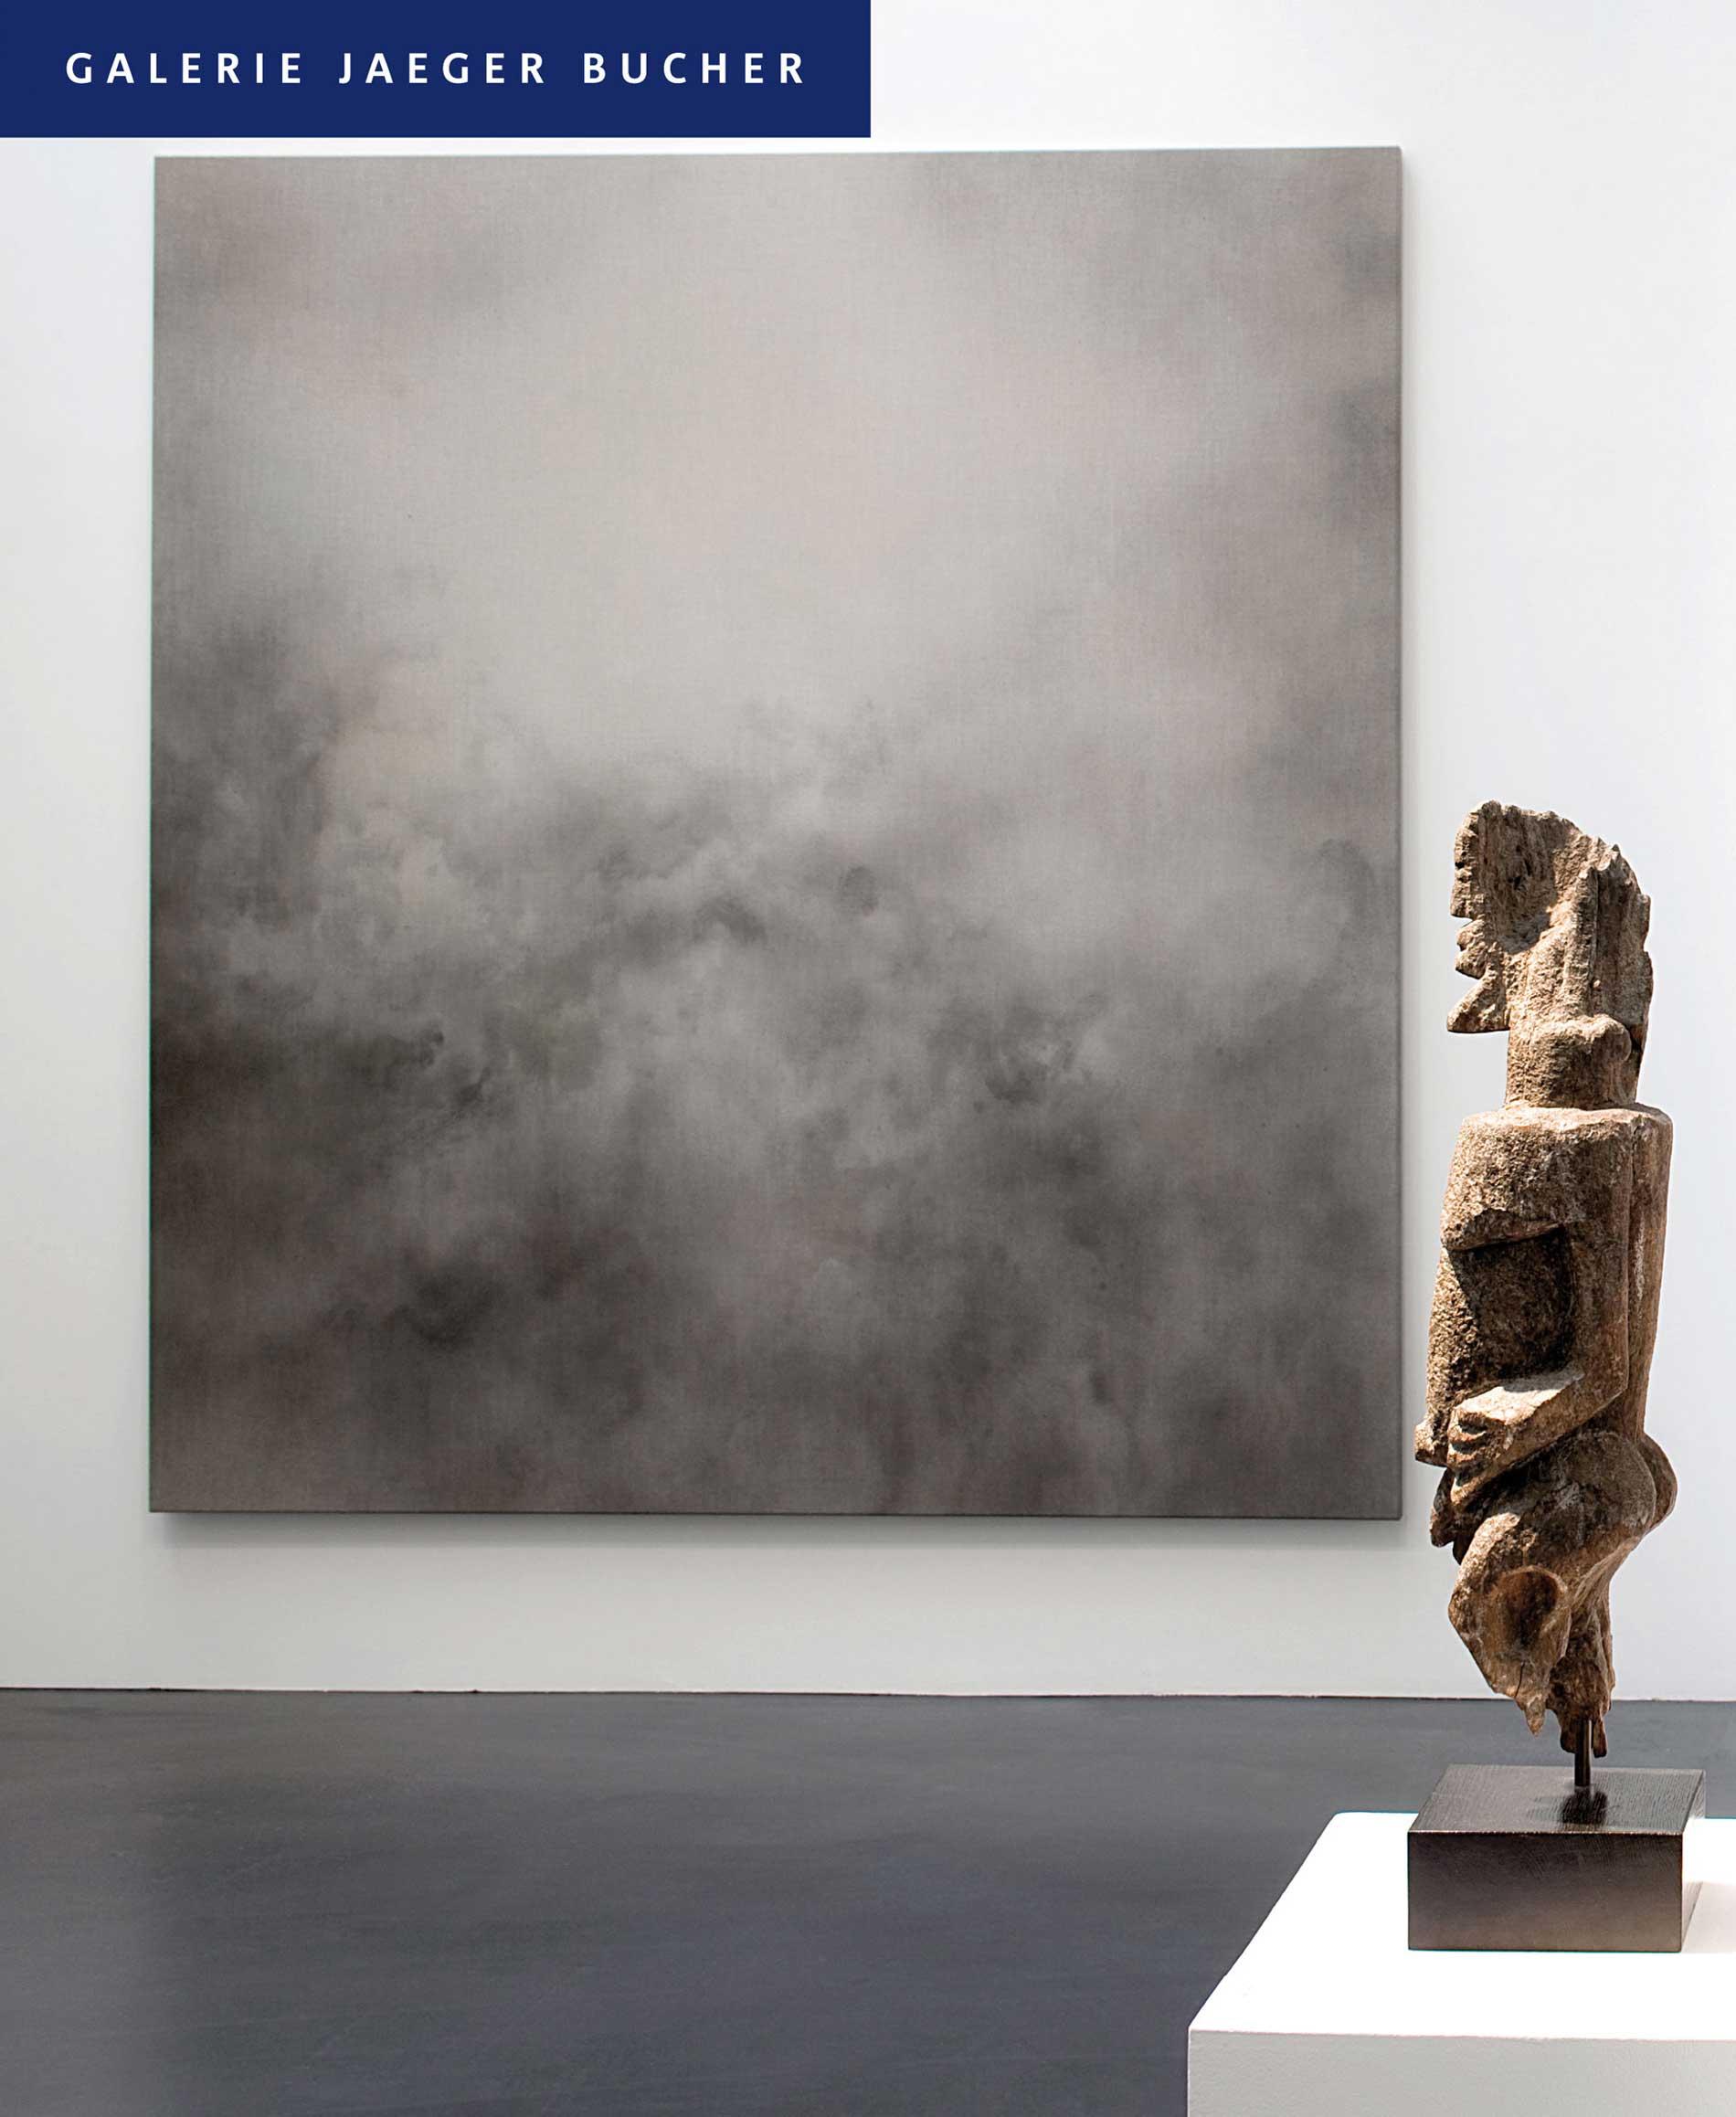 Éditions Galerie Jaeger Bucher